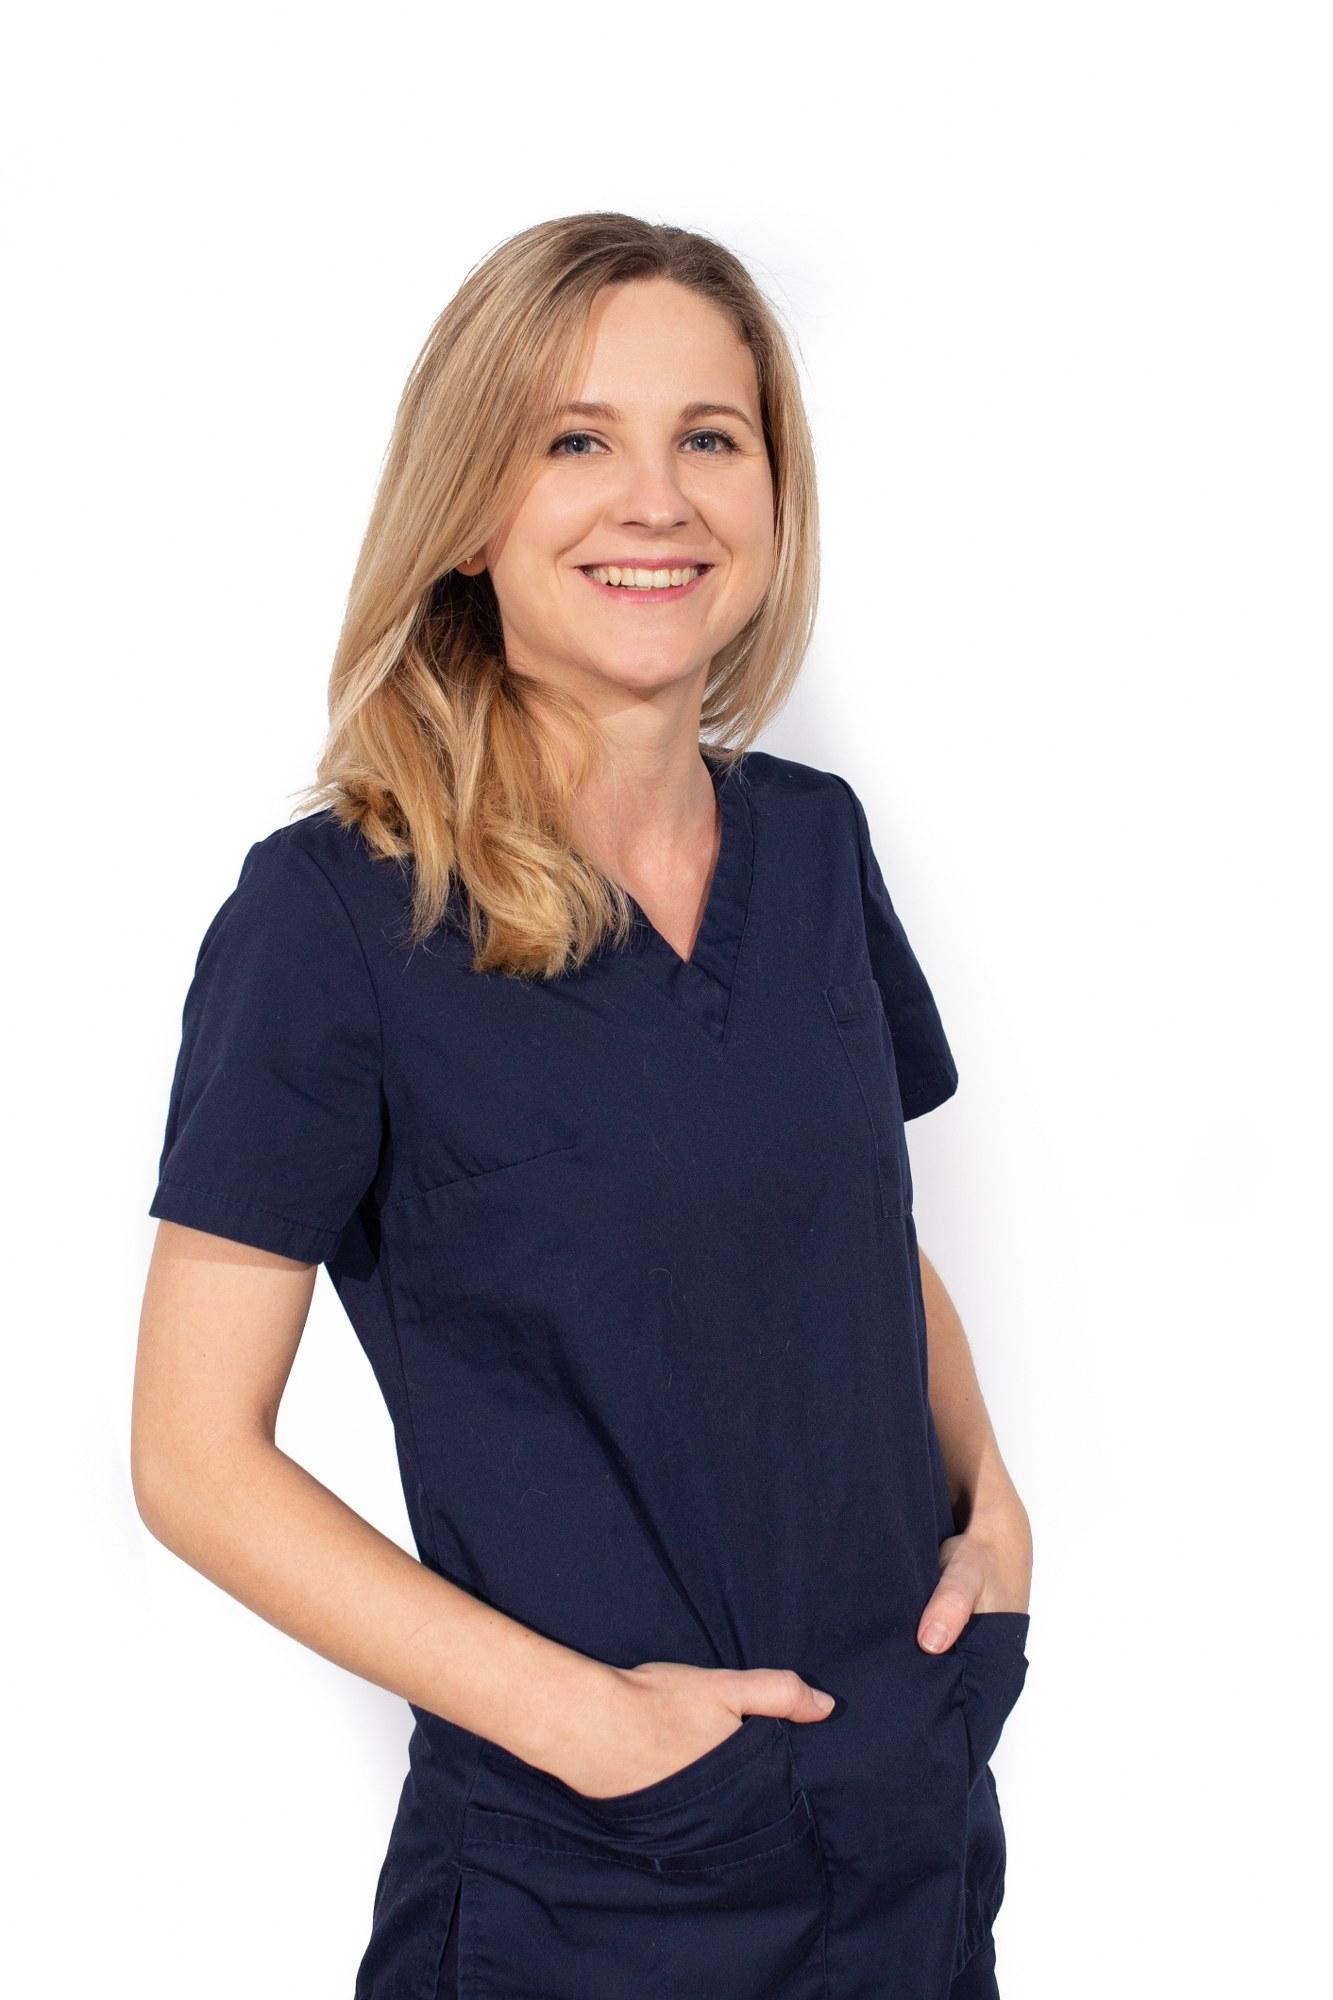 Agnieszka Keler